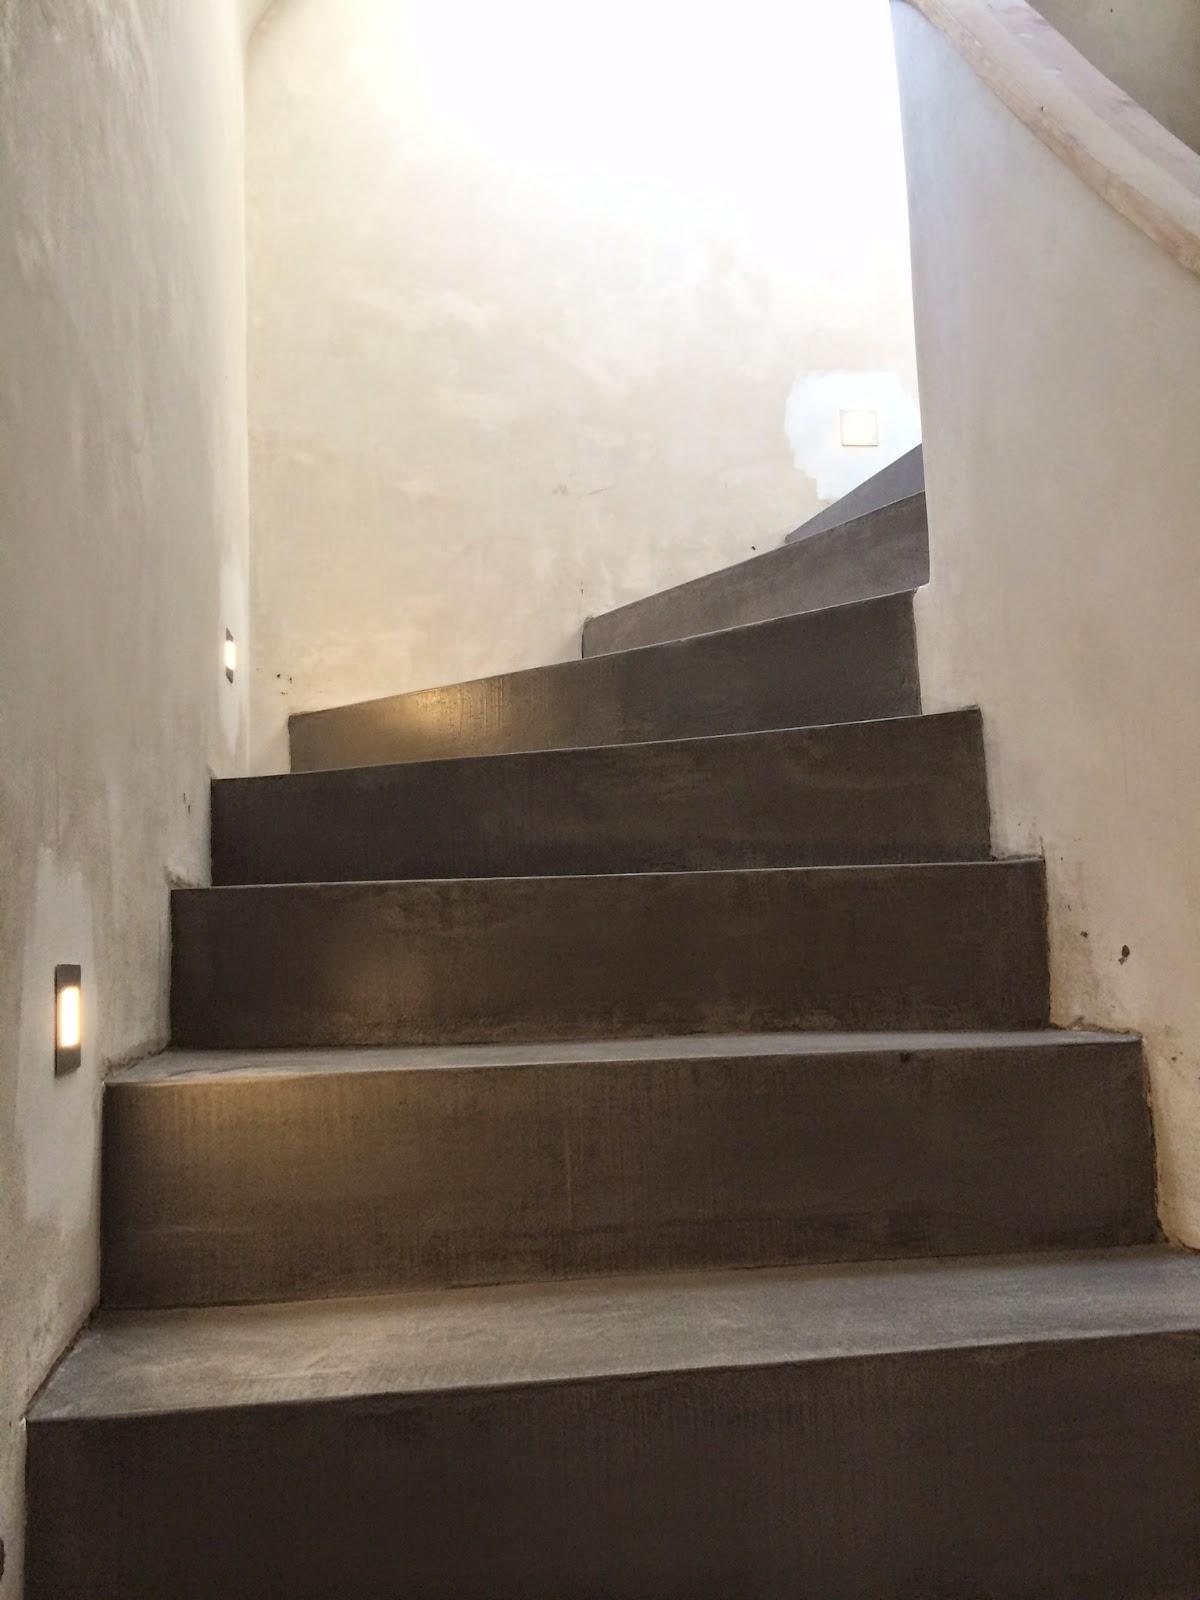 beton cire oberfl chen in beton look betontreppe beschichten sichtbetontreppe. Black Bedroom Furniture Sets. Home Design Ideas